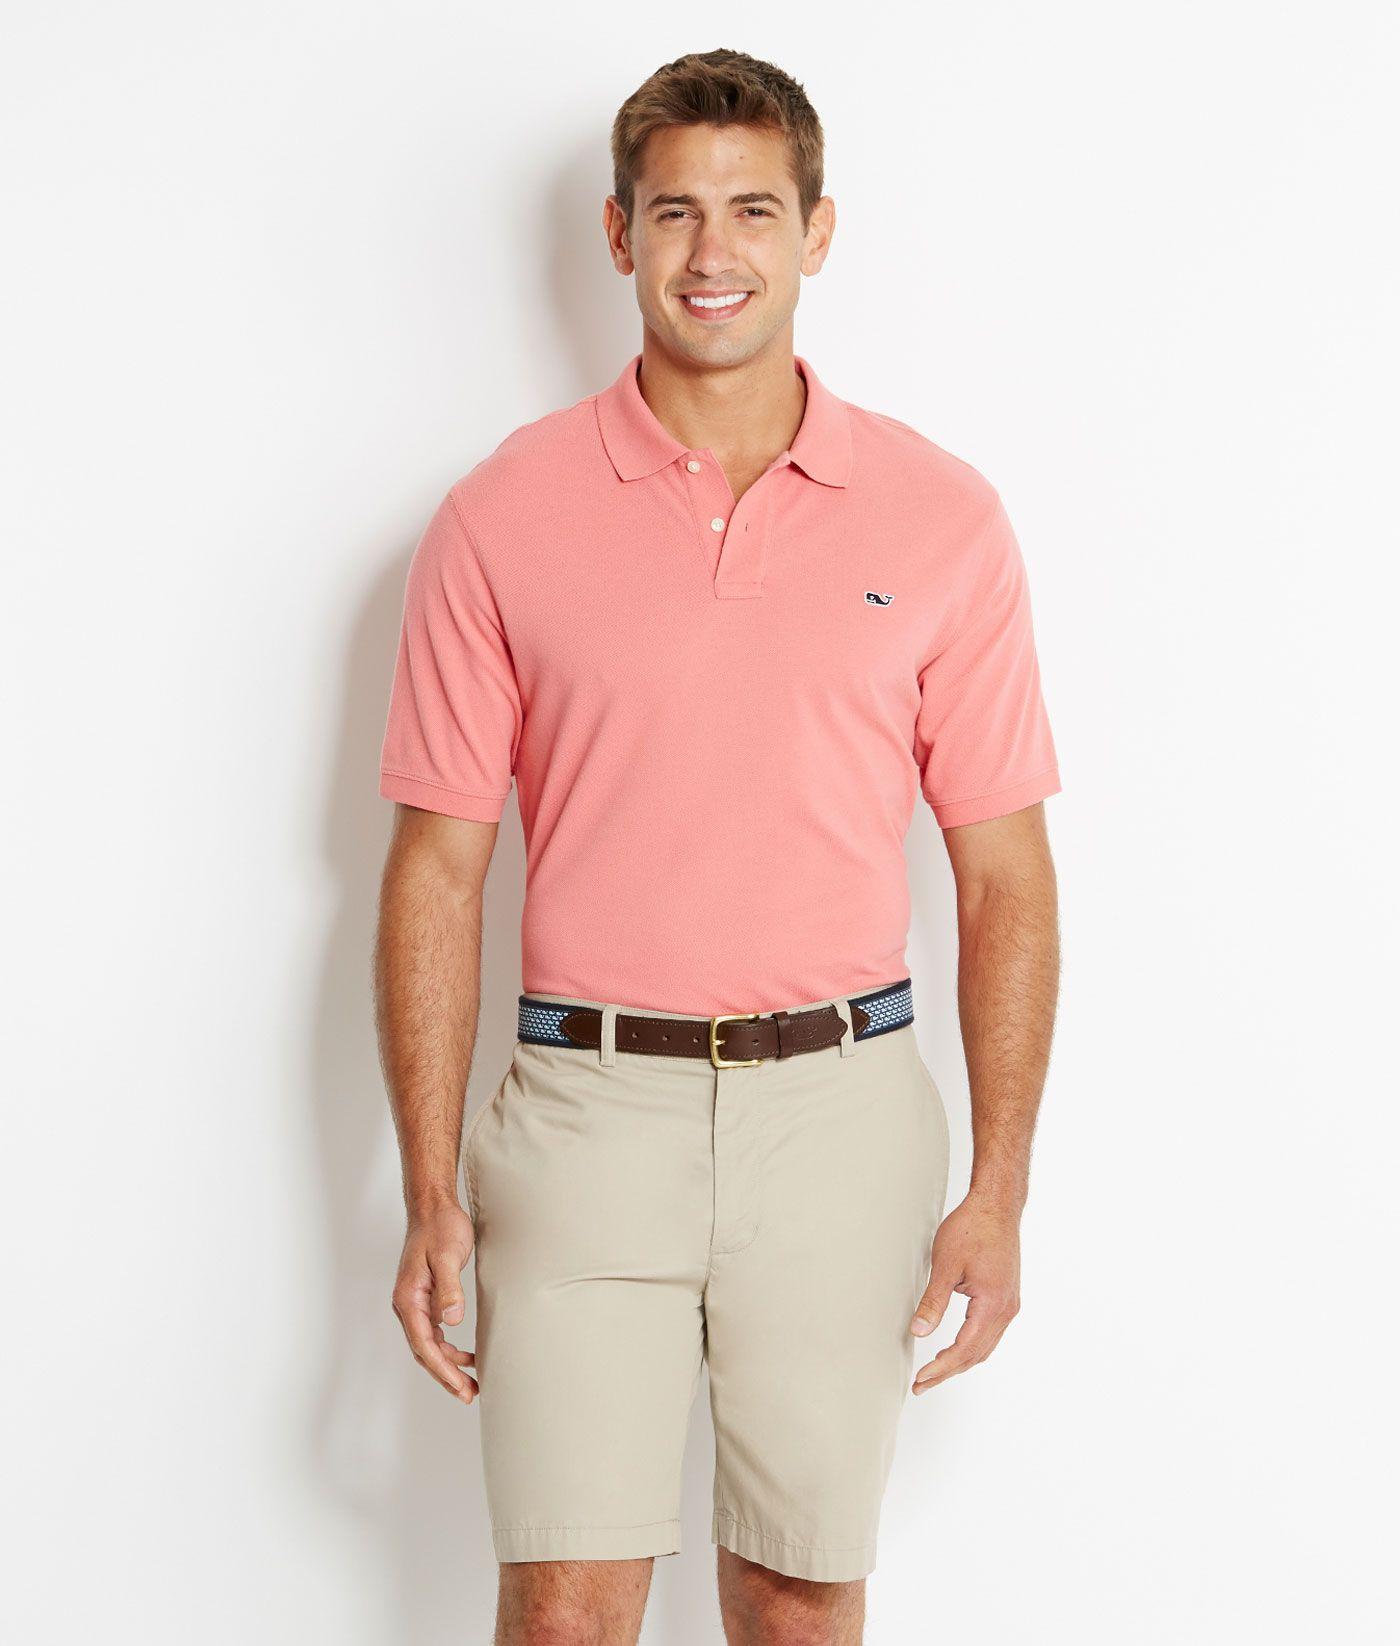 Men's Polo Shirts: Classic Polo Shirts for Men – Vineyard Vines ...